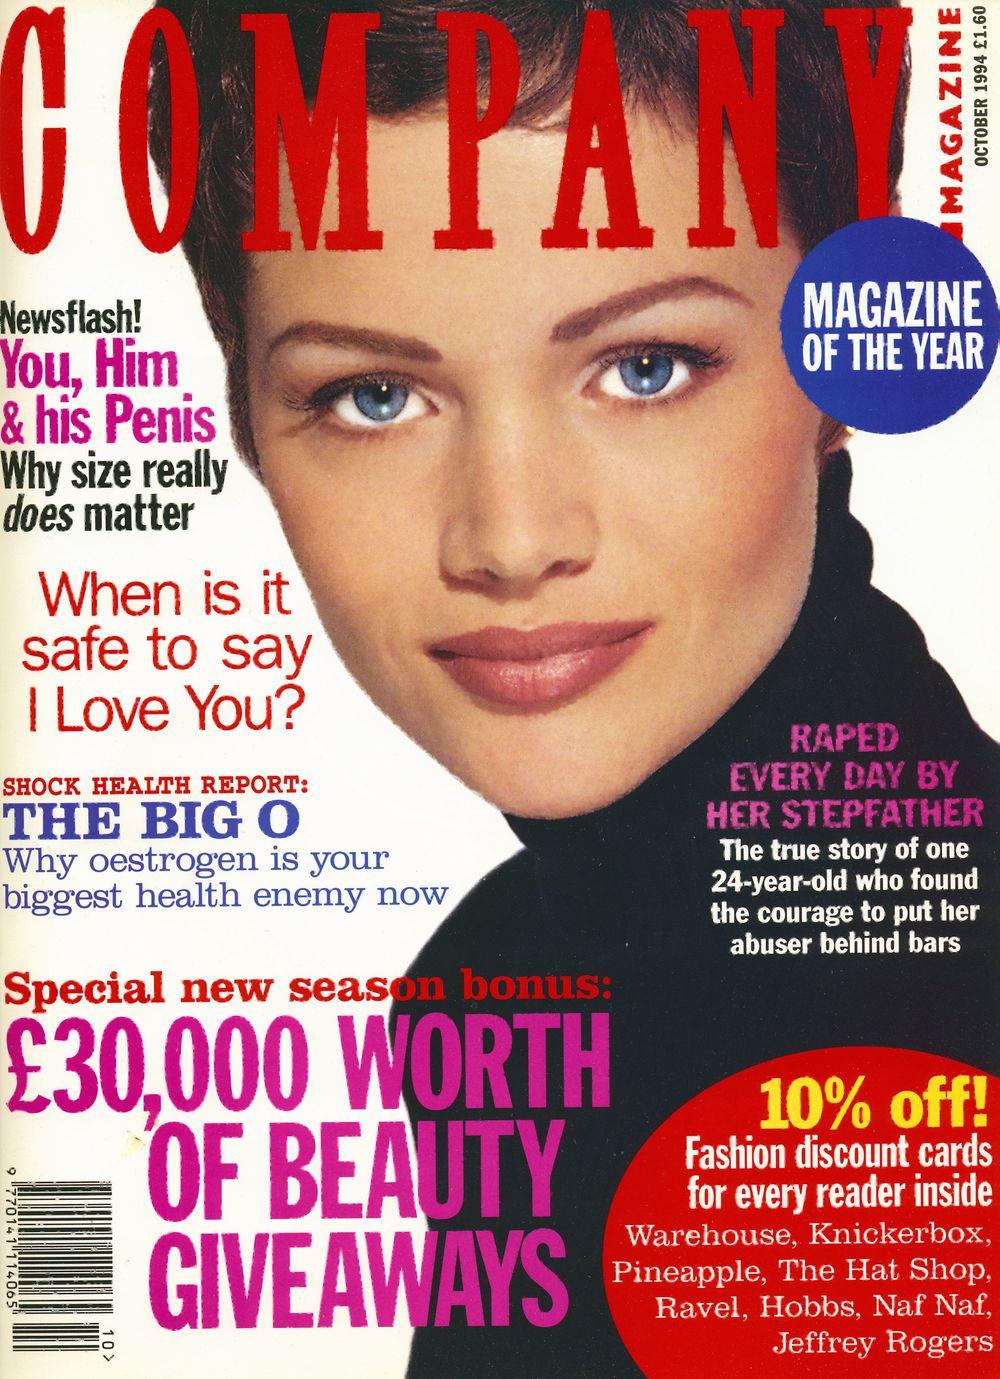 Company cover 5.jpg